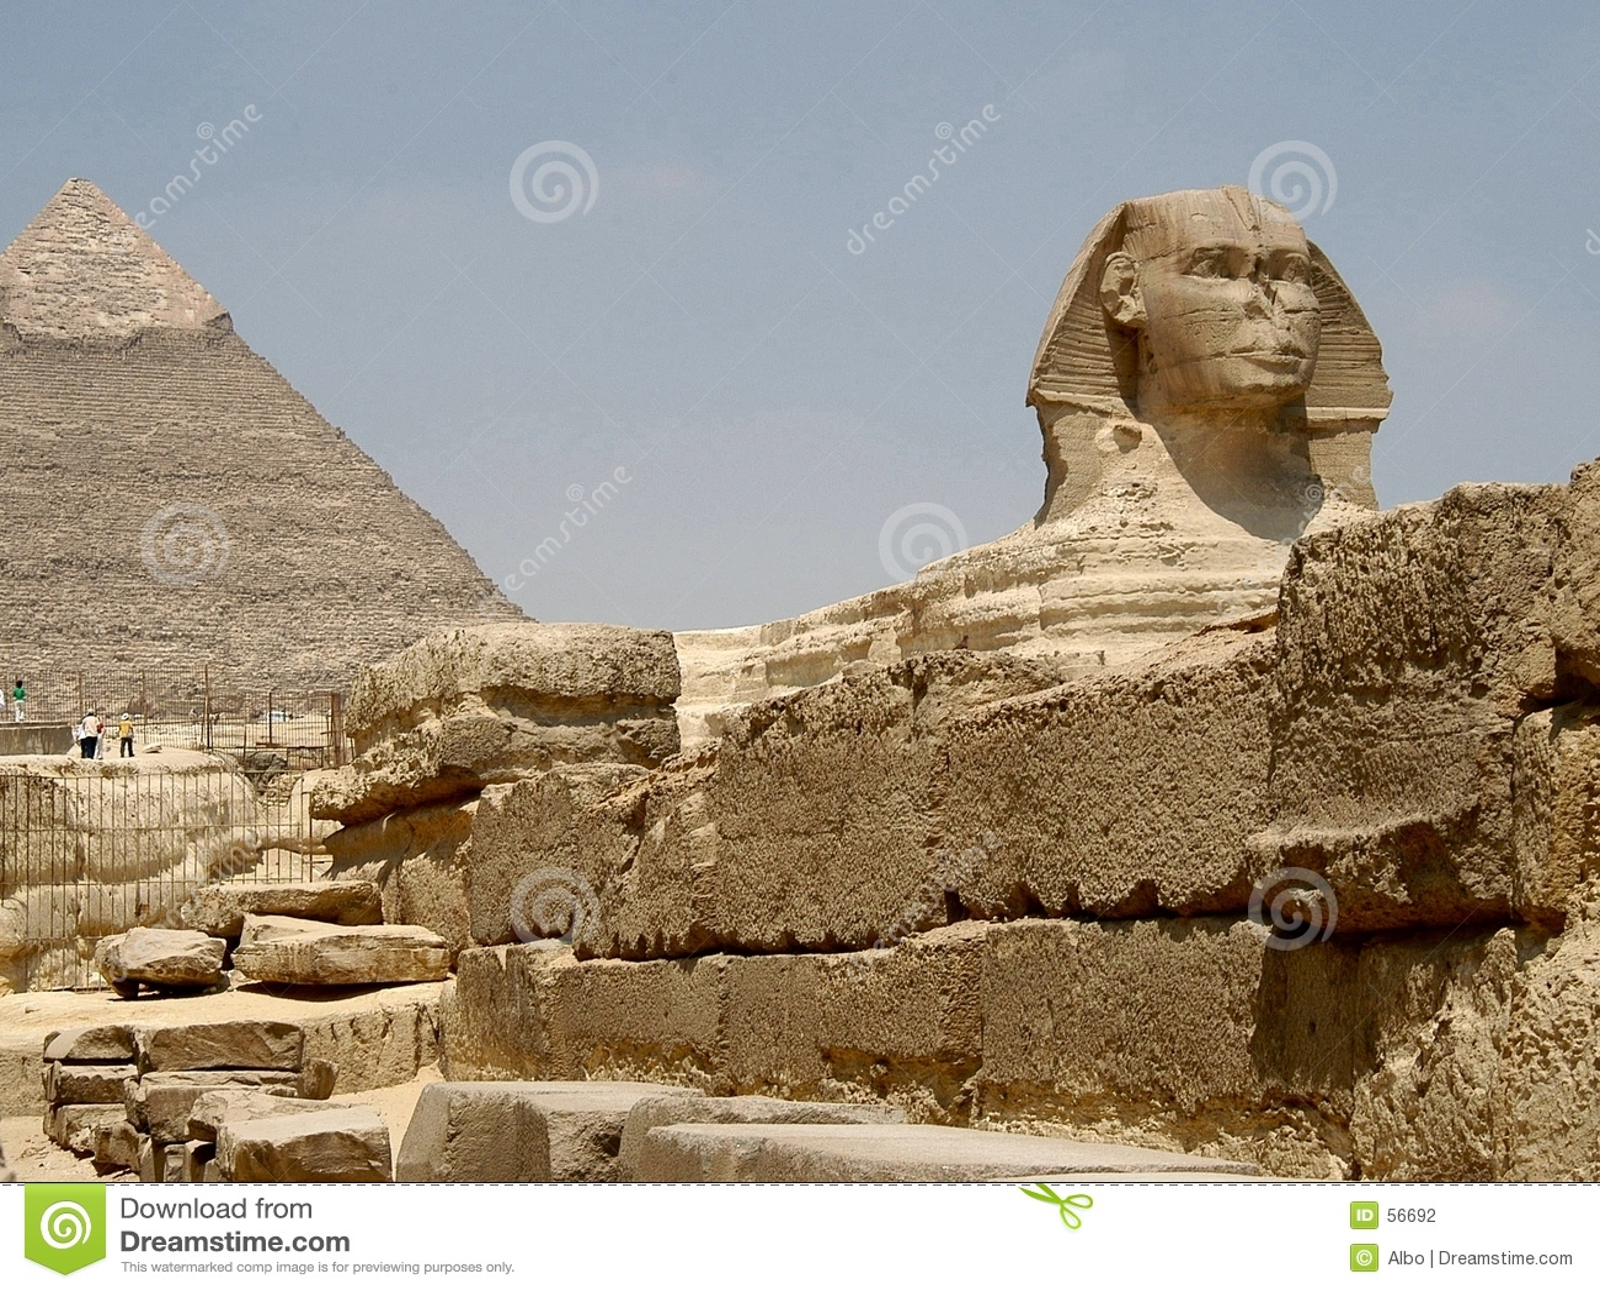 Download Pyramide et Sphynx photo stock. Image du chaud, antique - 56692